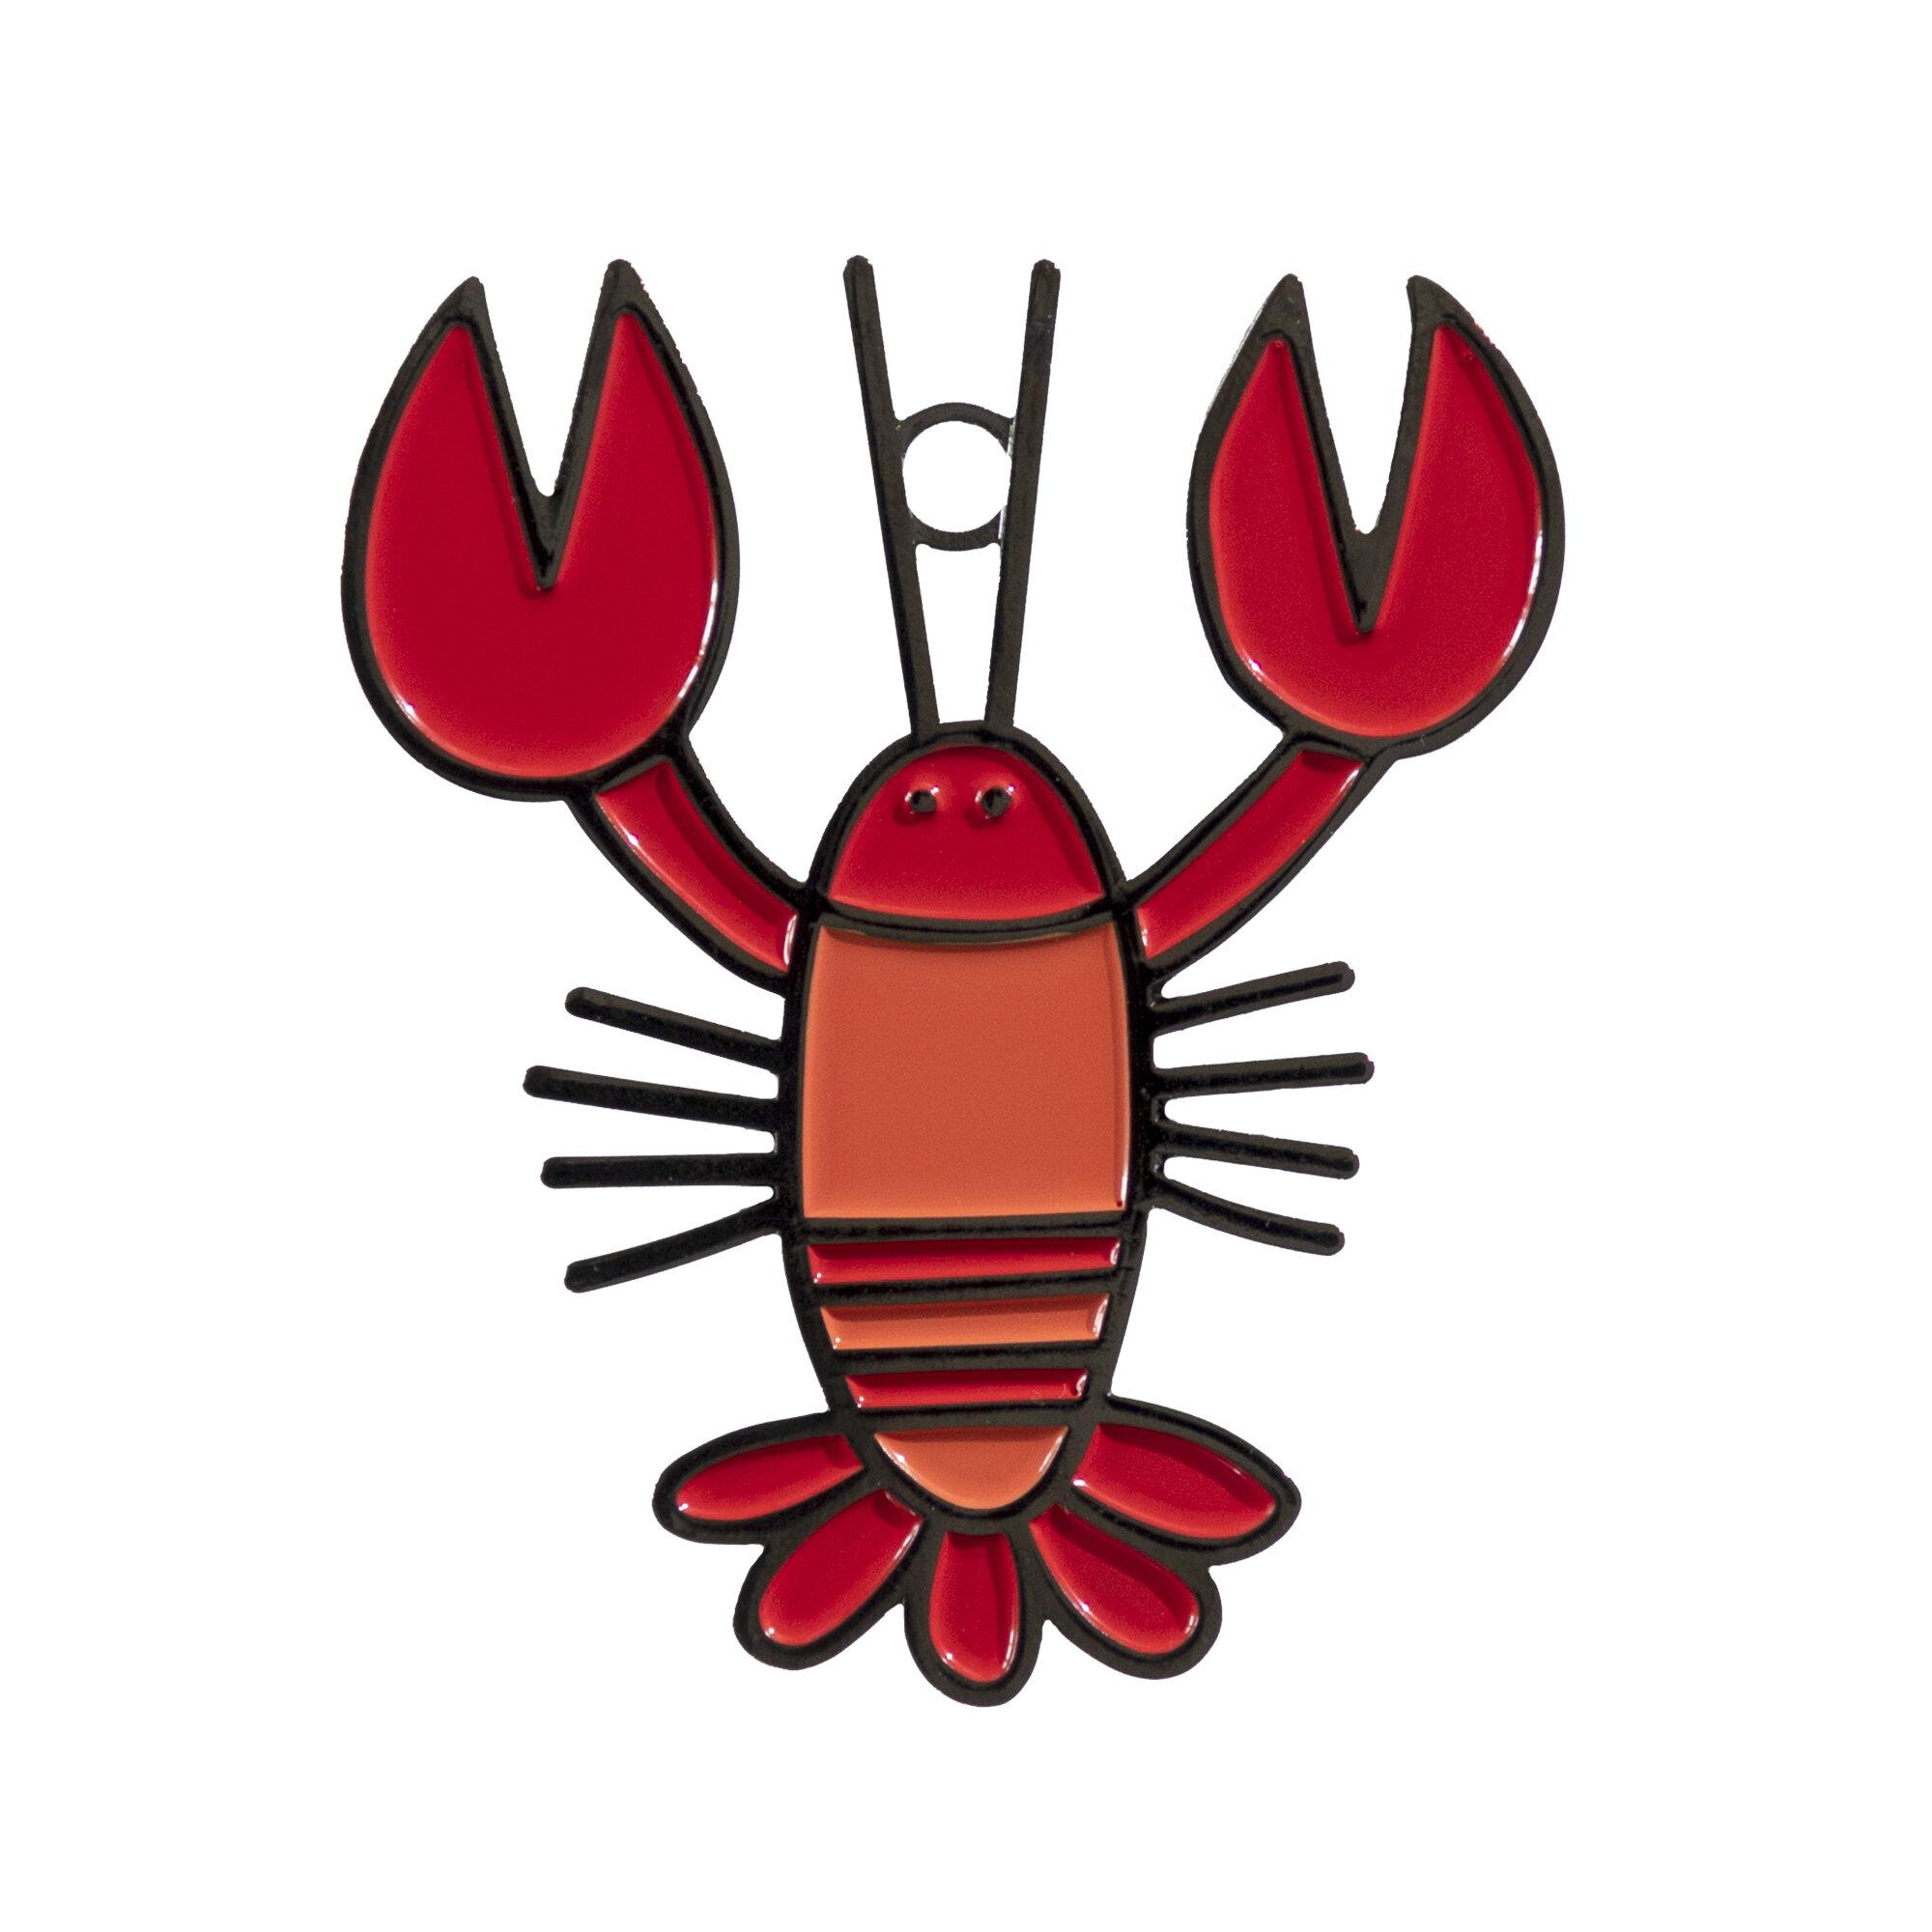 Easy Tiger Lobster Hanging Figurine Ornament Wayfair